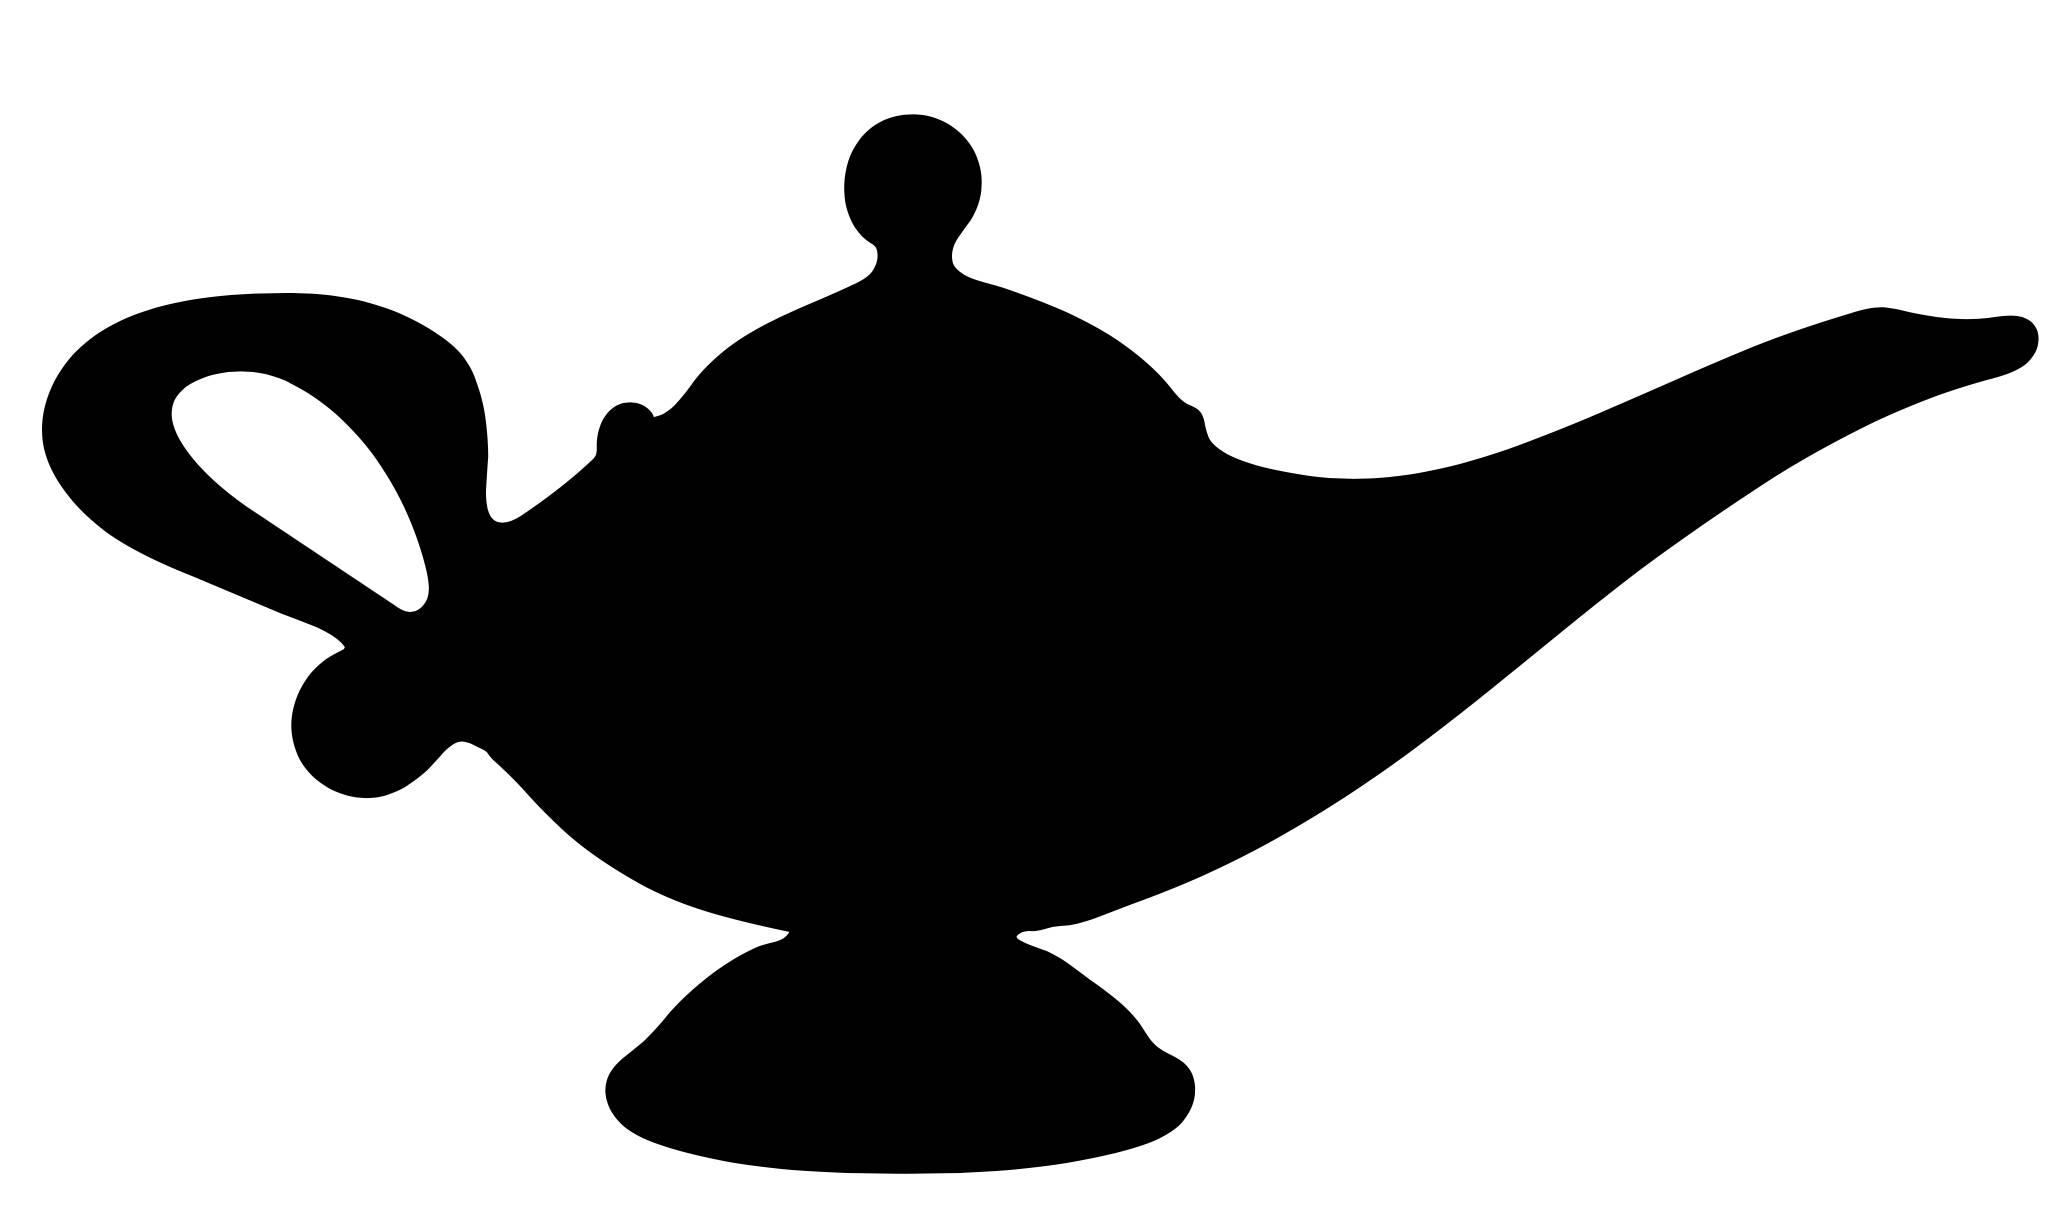 Genie Lamp Silhouette at GetDrawings.com.